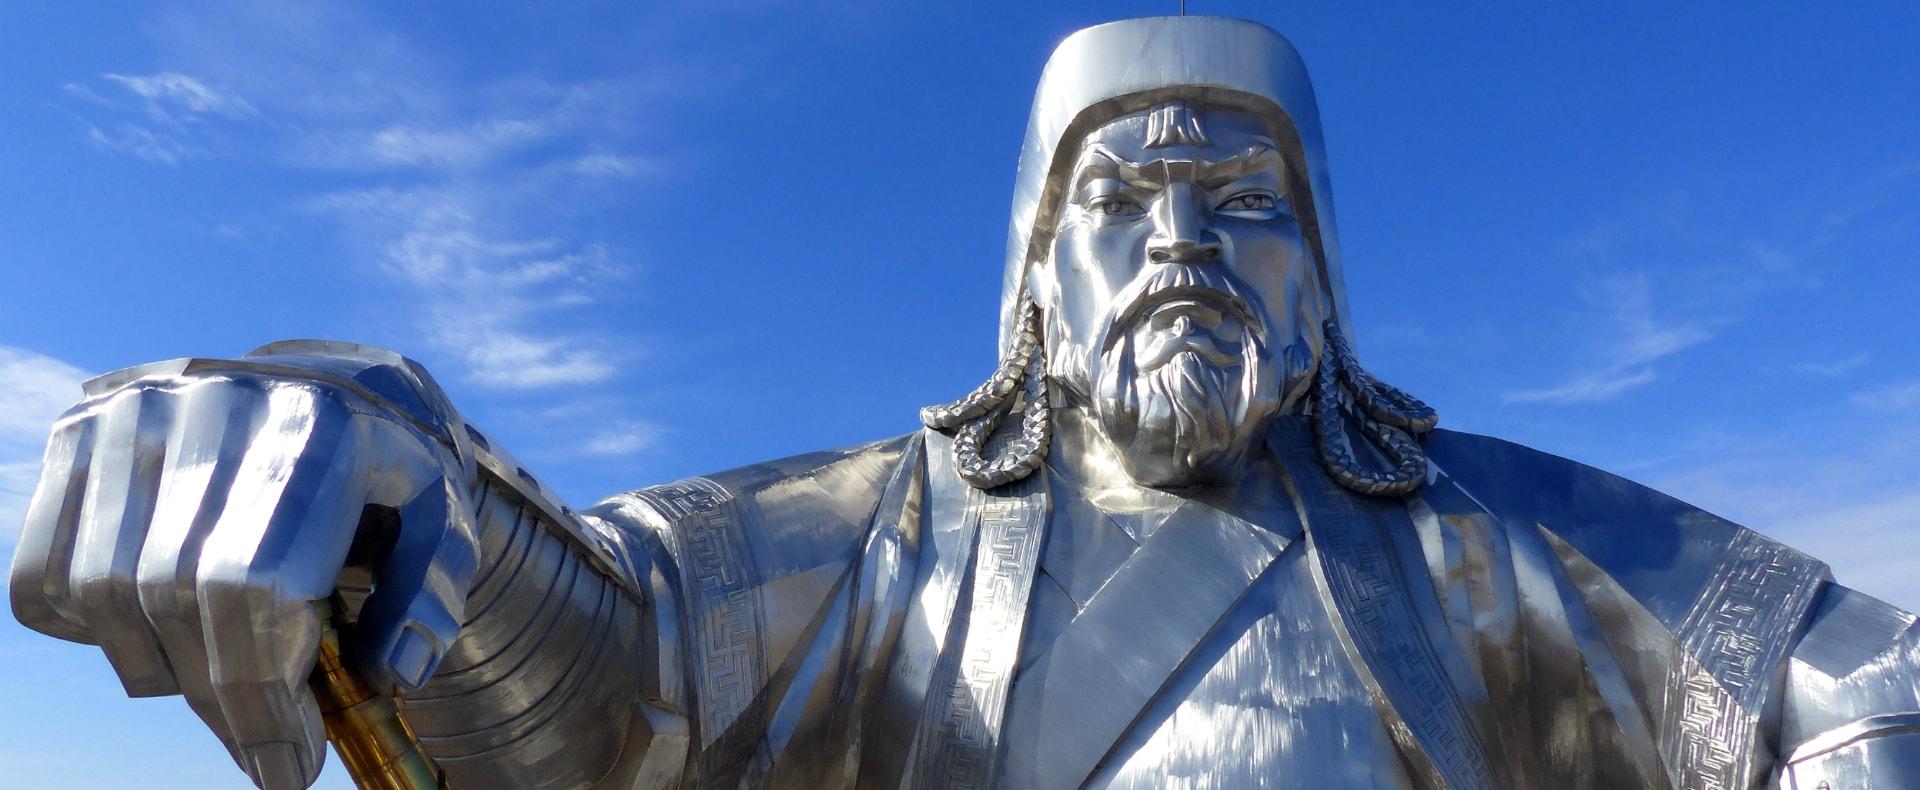 Mongolia Statue